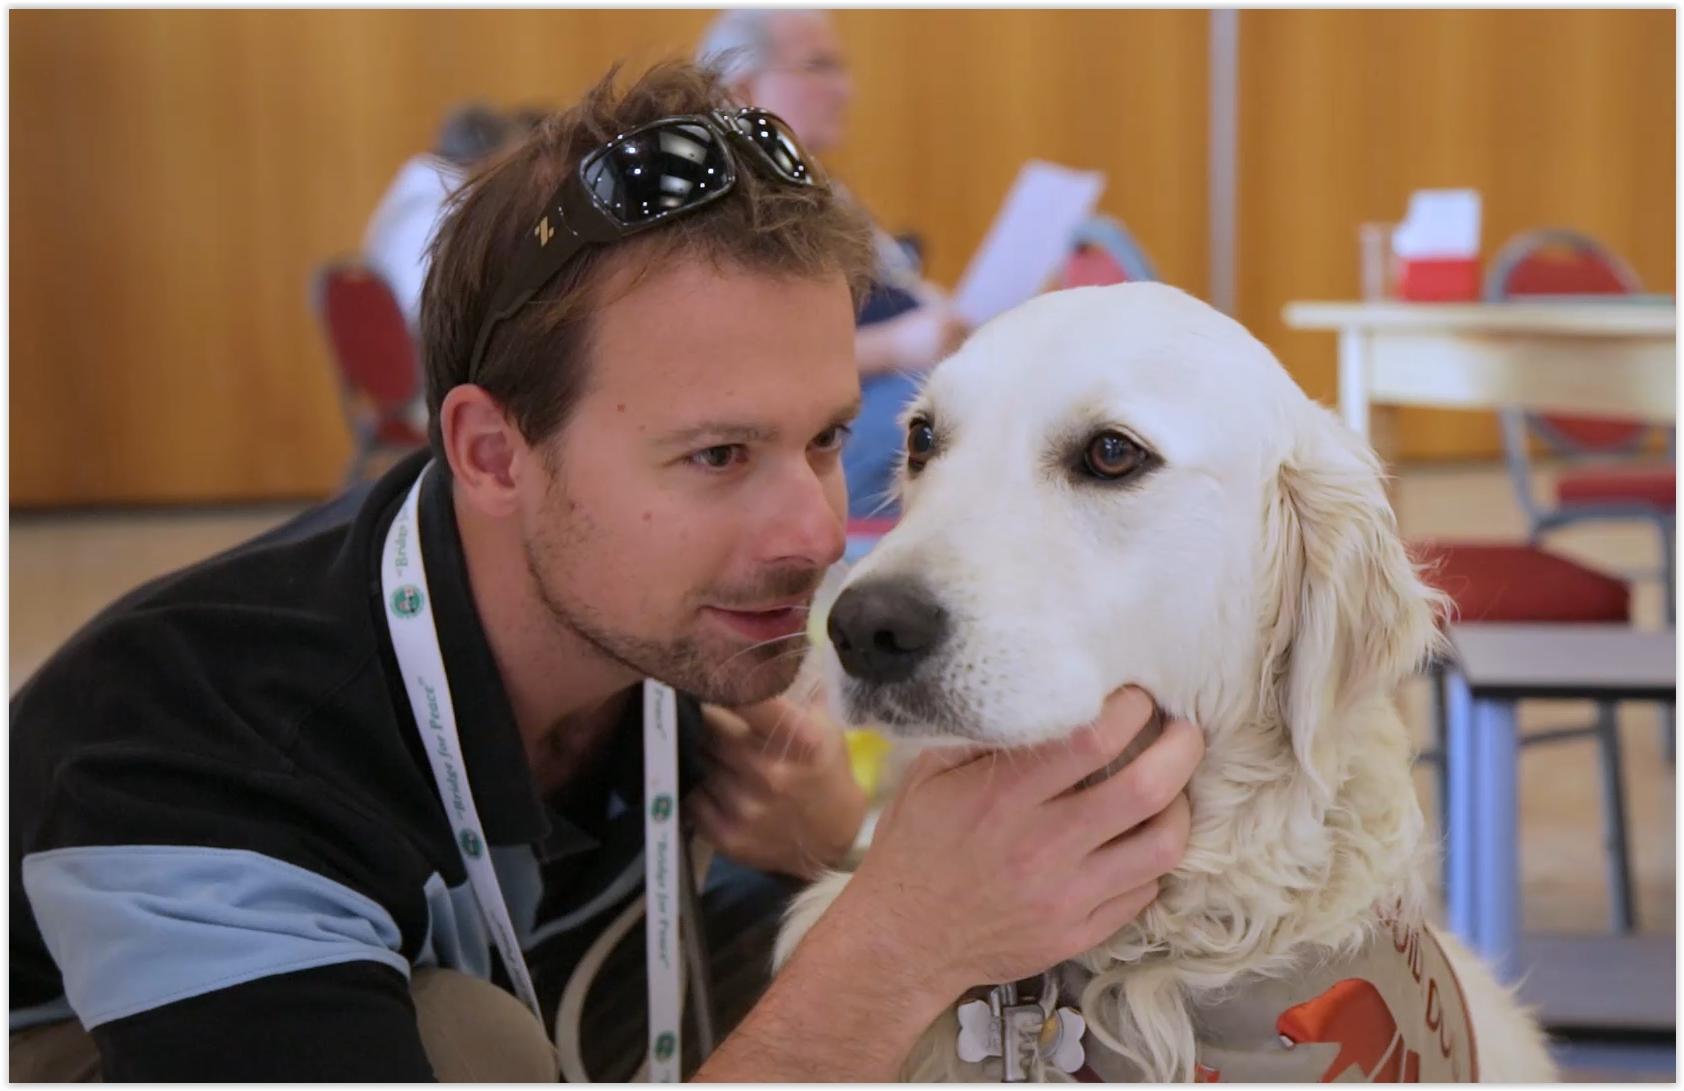 jerome et son chien.JPG